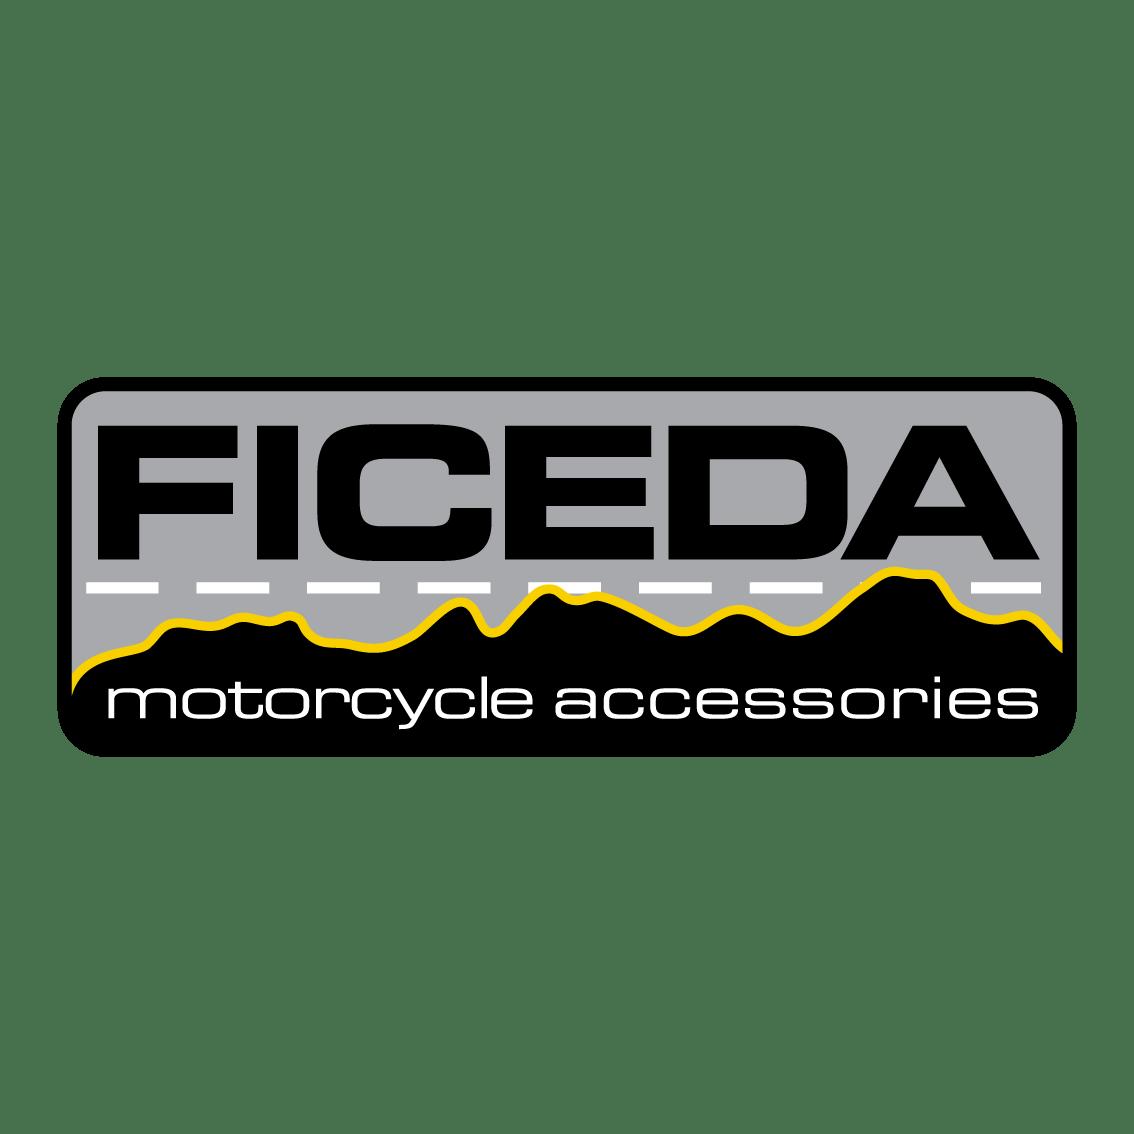 Ficeda grey, black and yellow logo